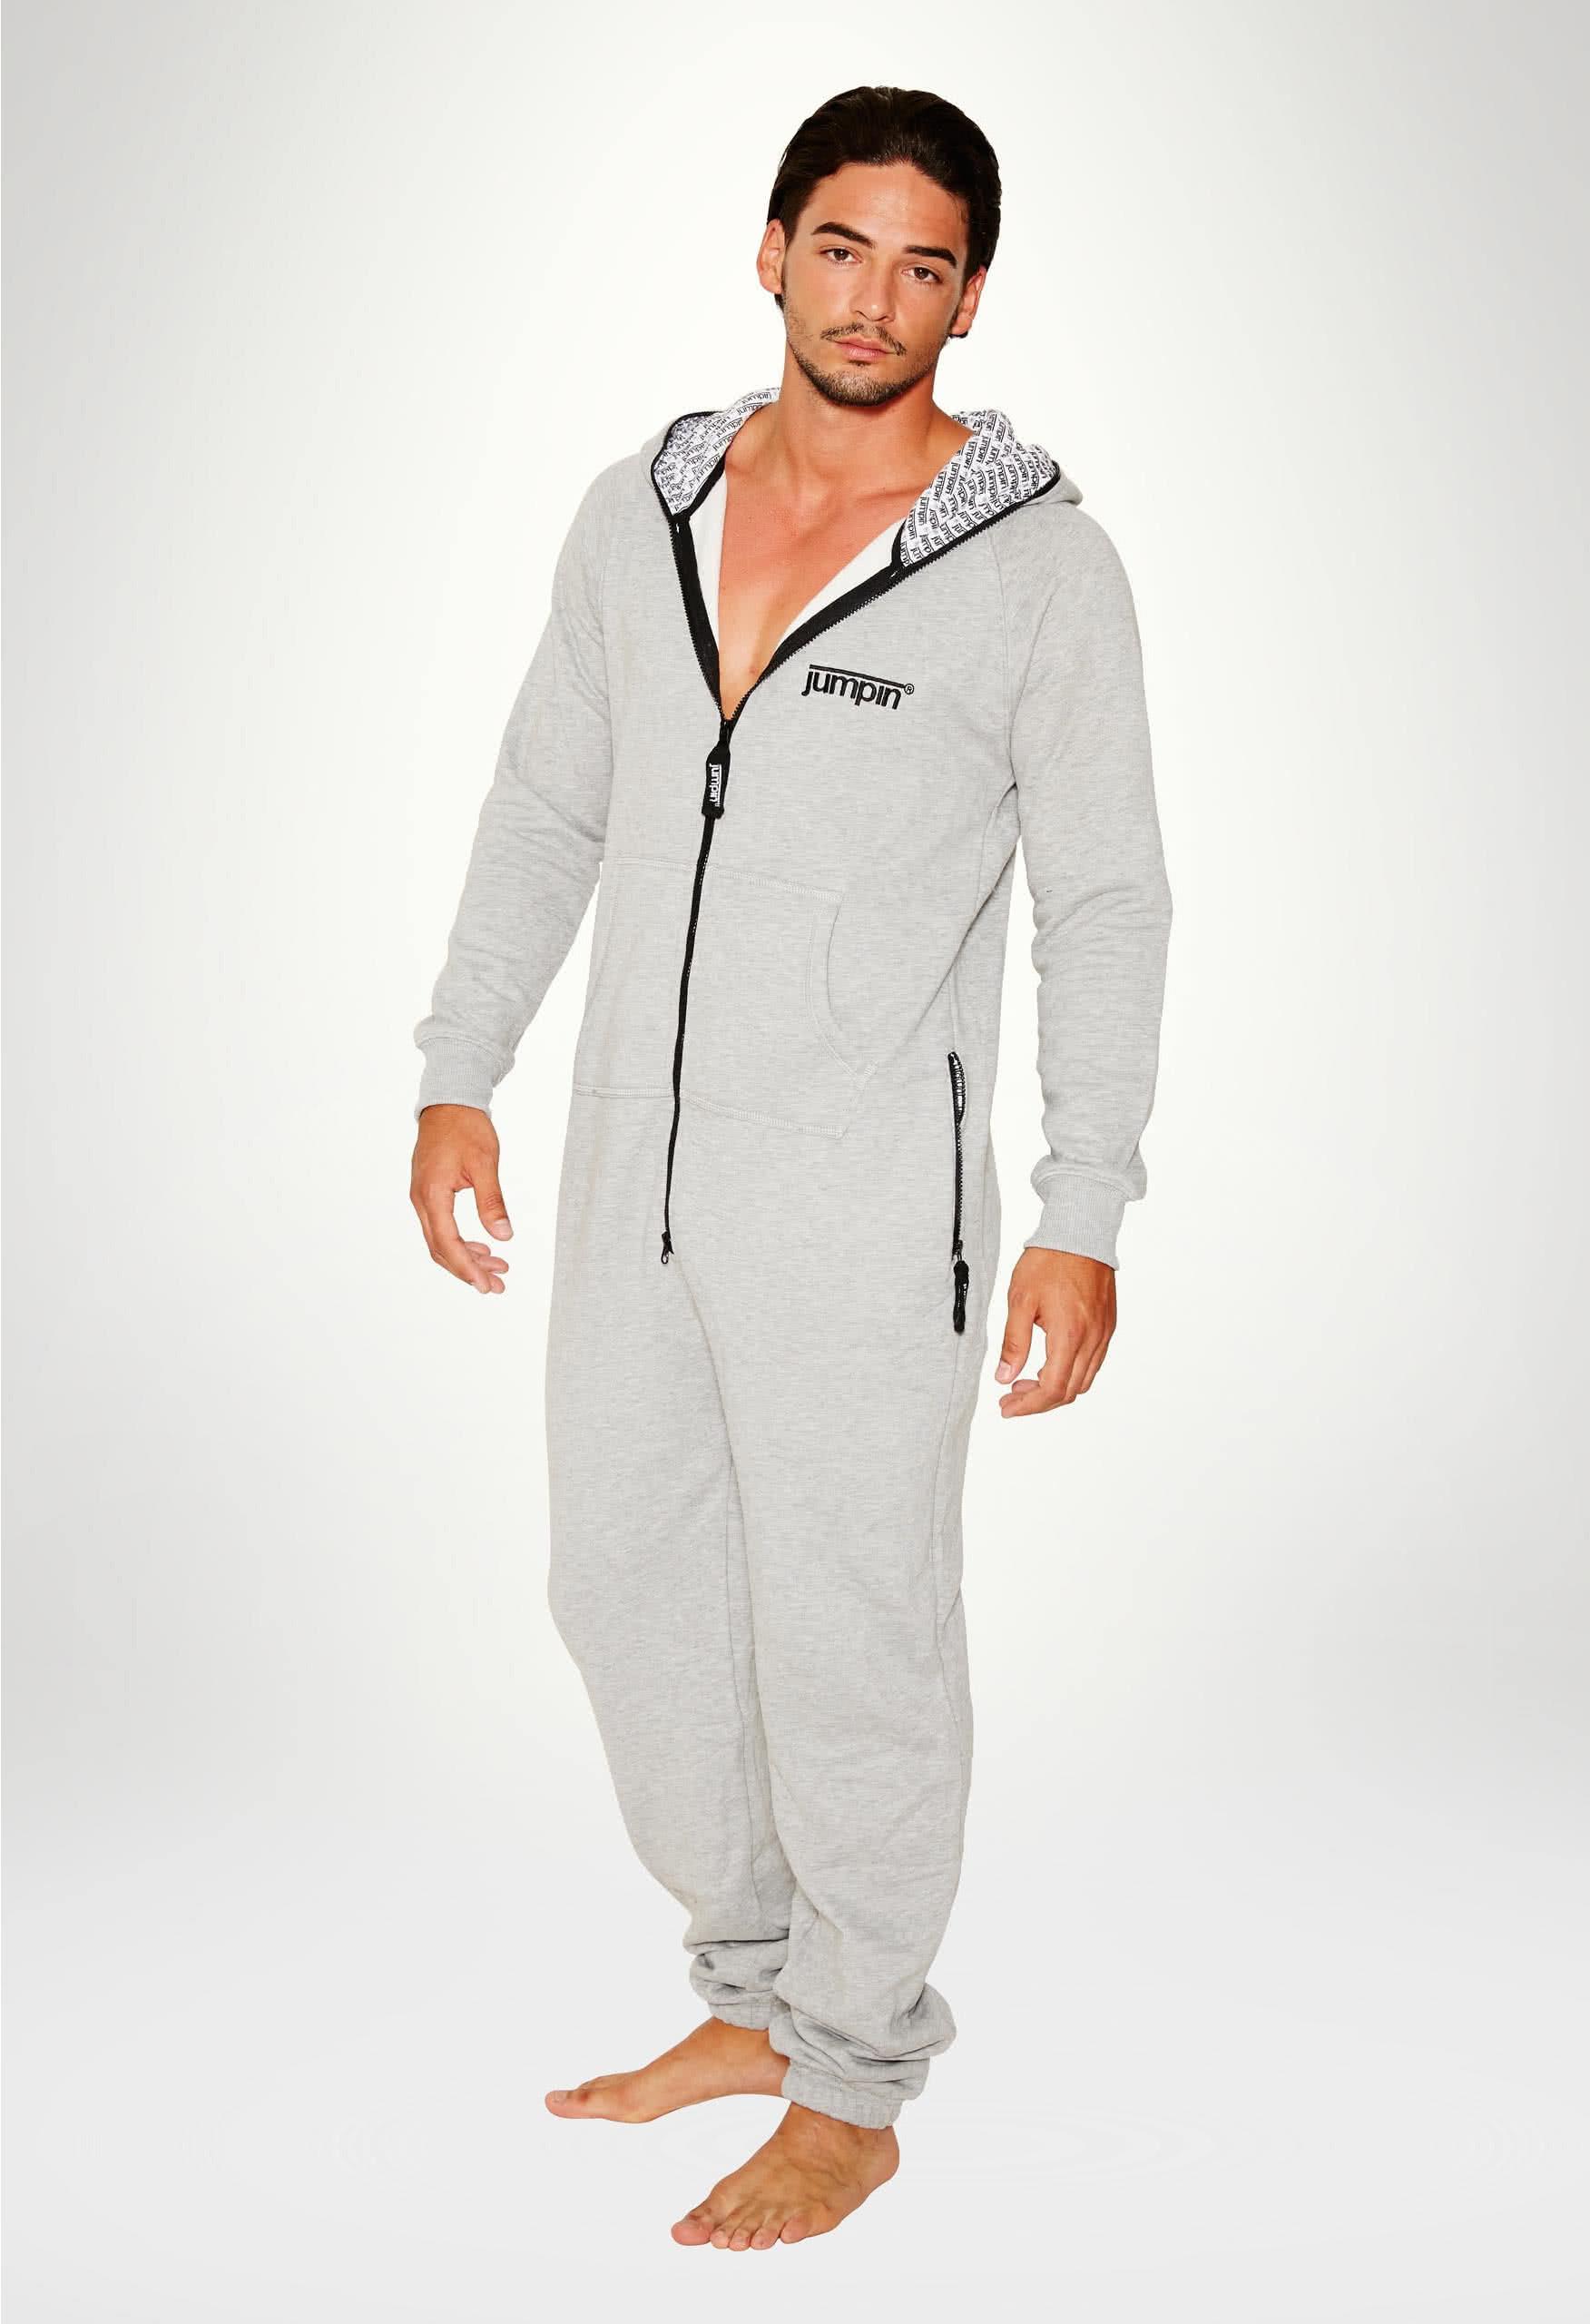 Jumpsuit Original Grau 2.0 - Herren